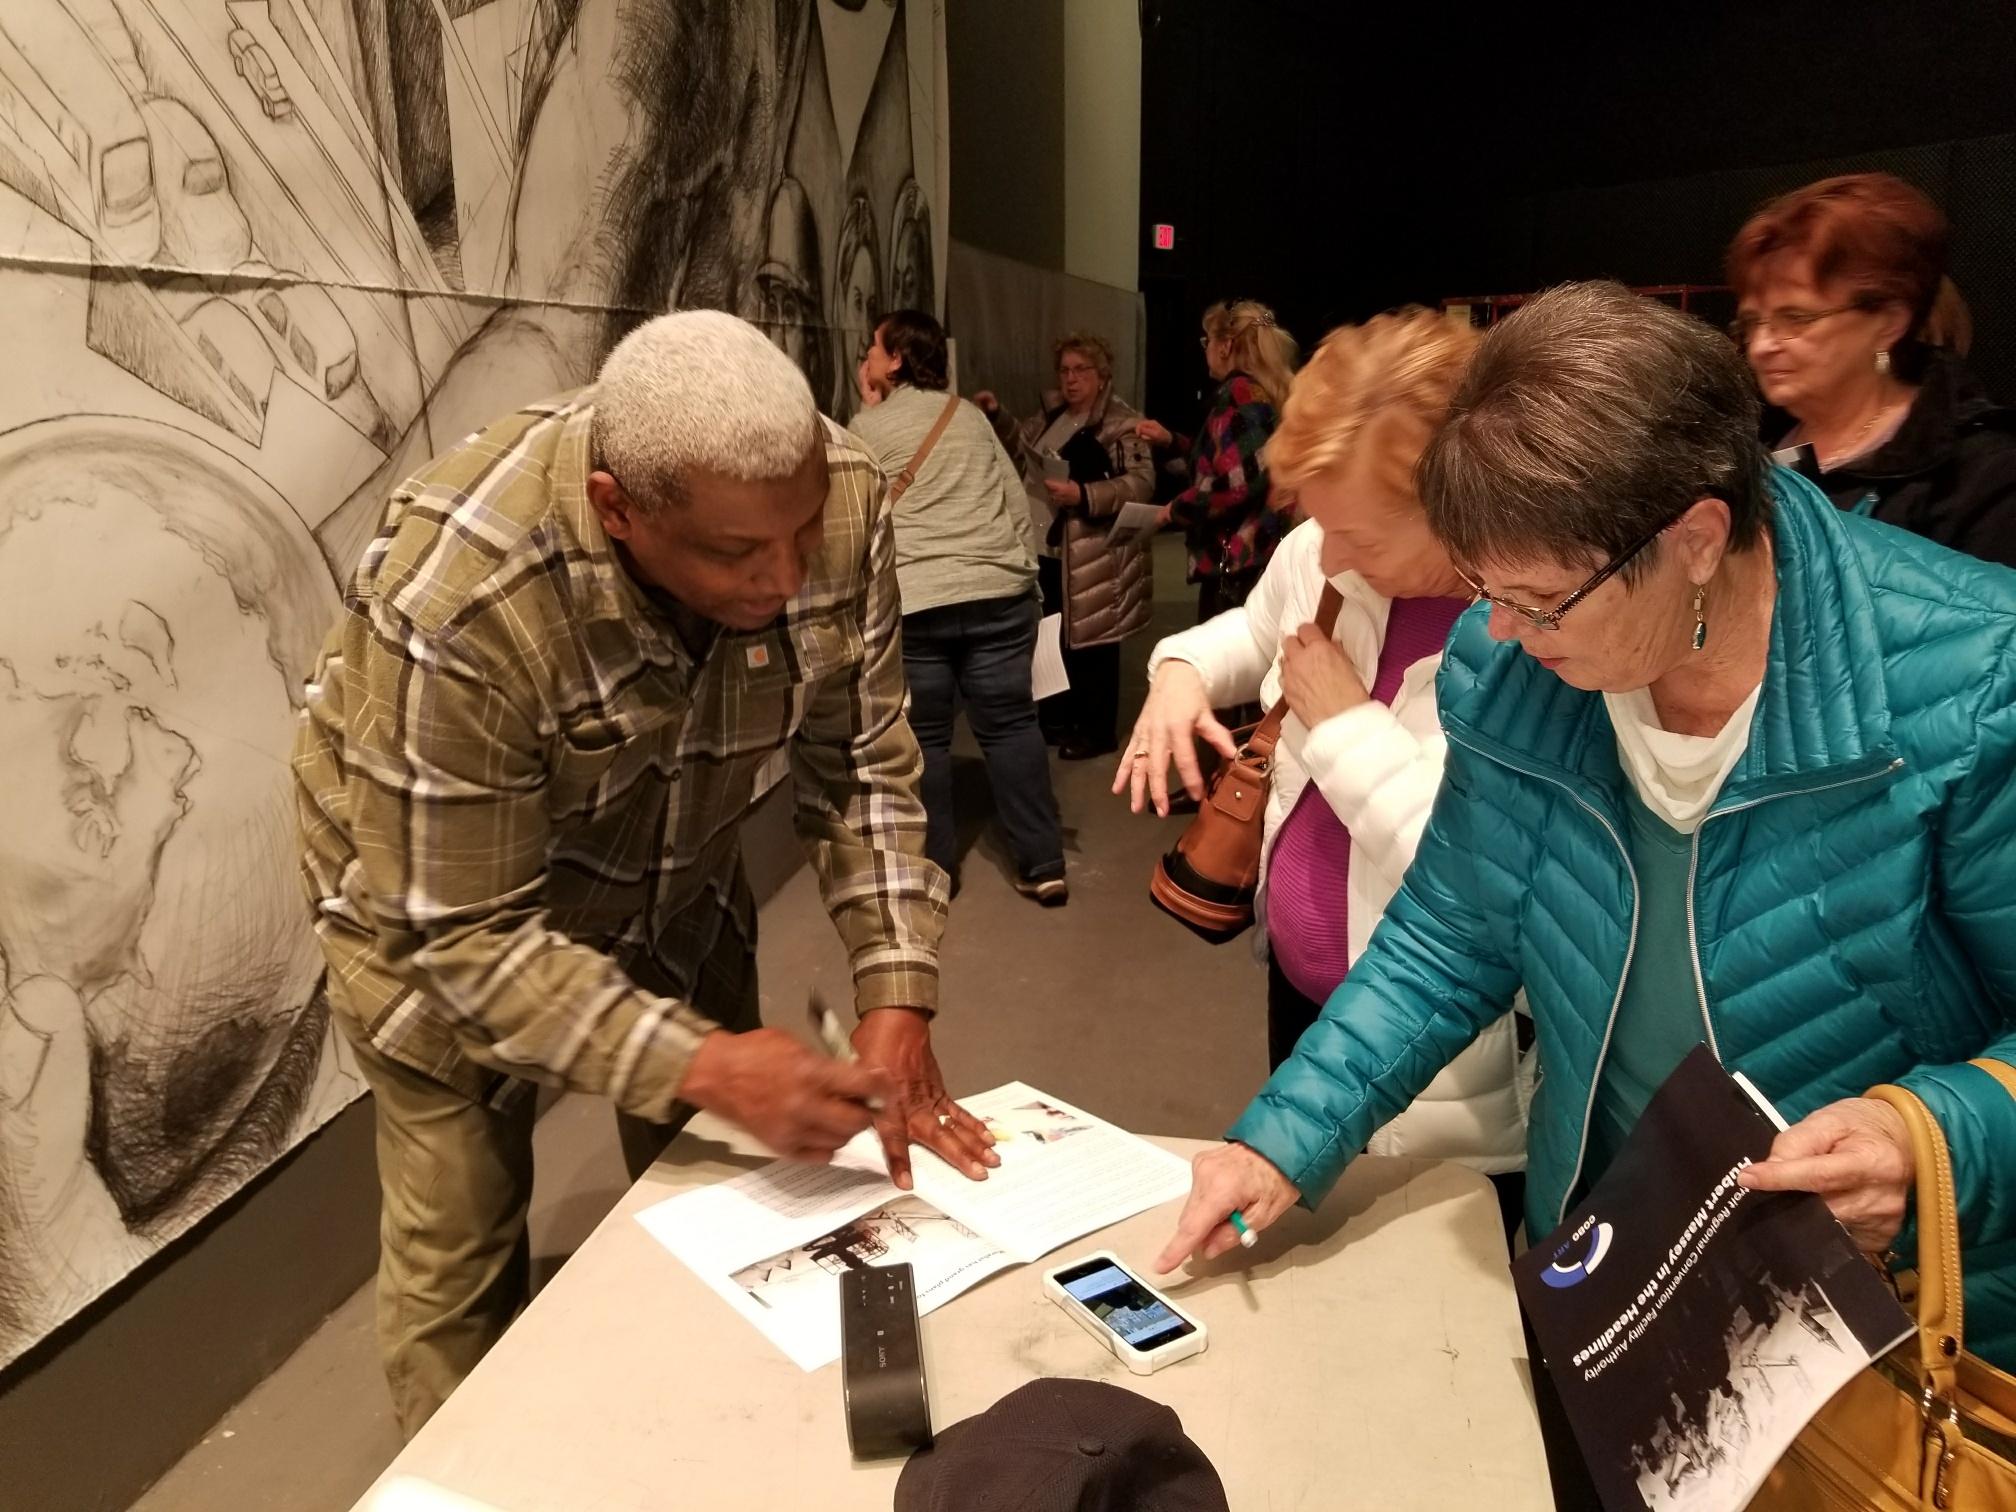 Hubert Massey signing autographs